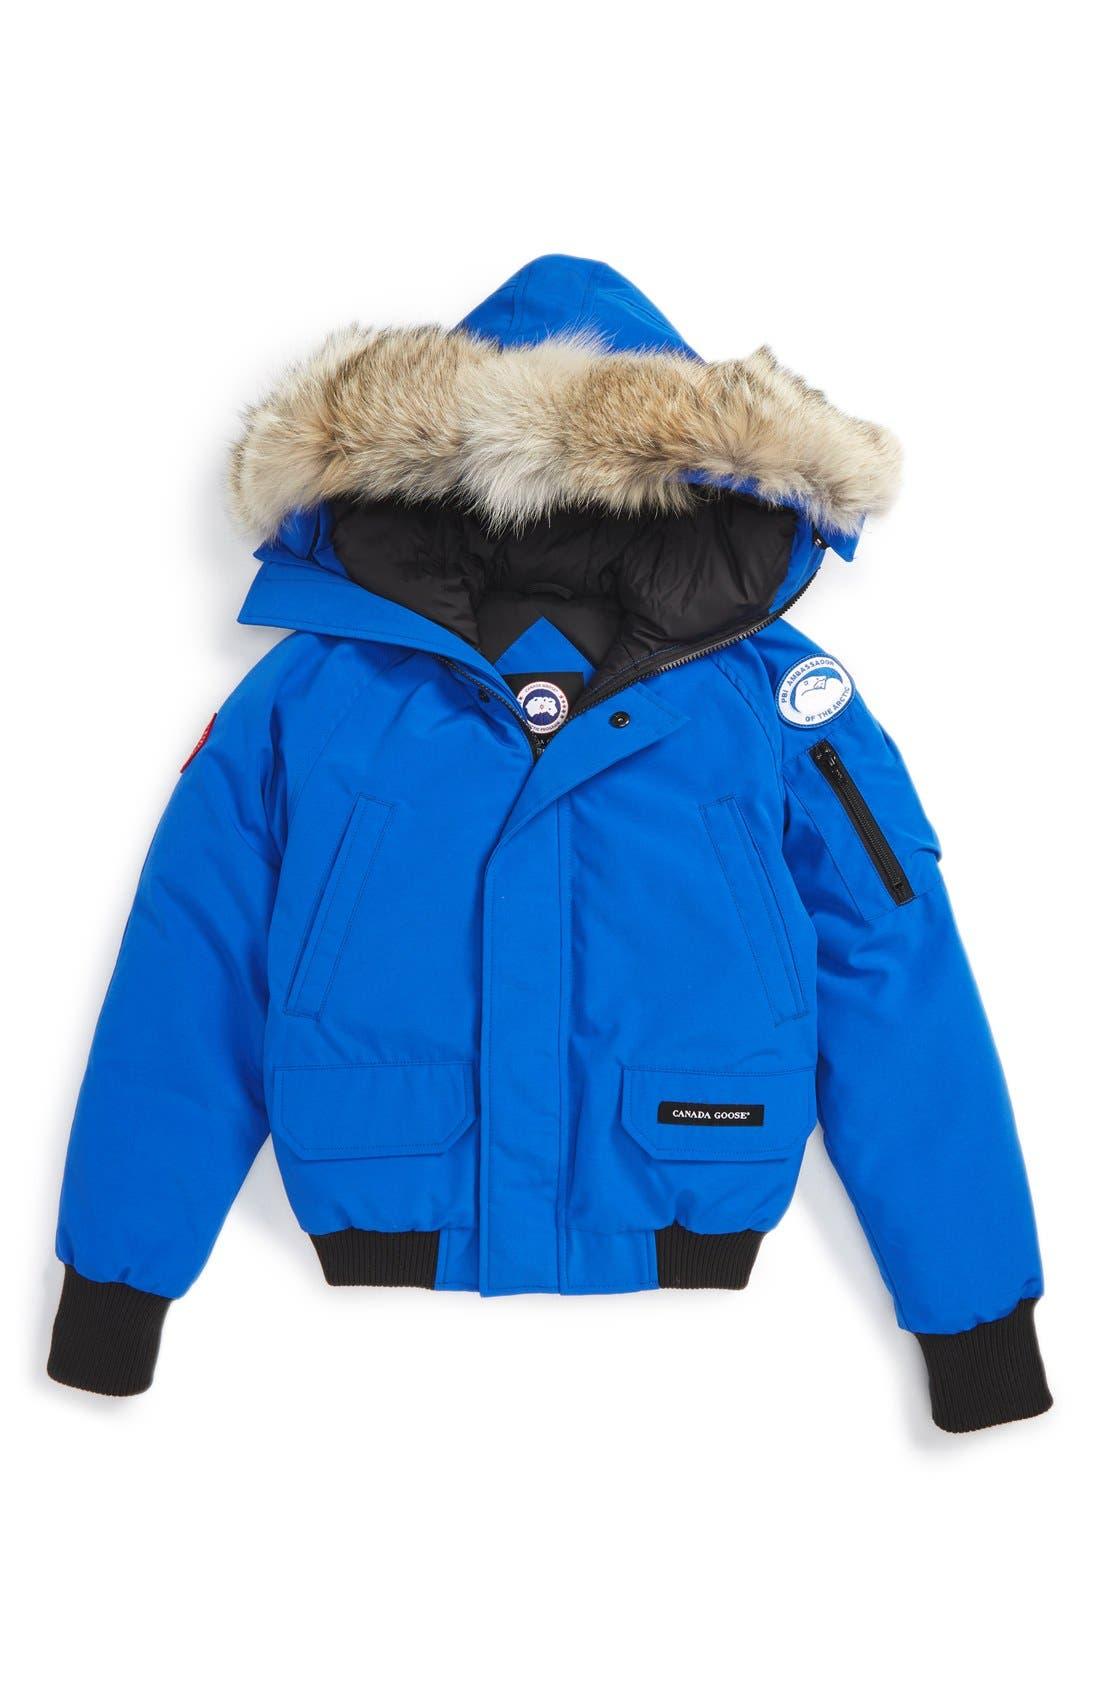 Main Image - Canada Goose 'PBI Chilliwack' Hooded Bomber Jacket with Genuine Coyote Fur Trim (Little Boys & Big Boys)